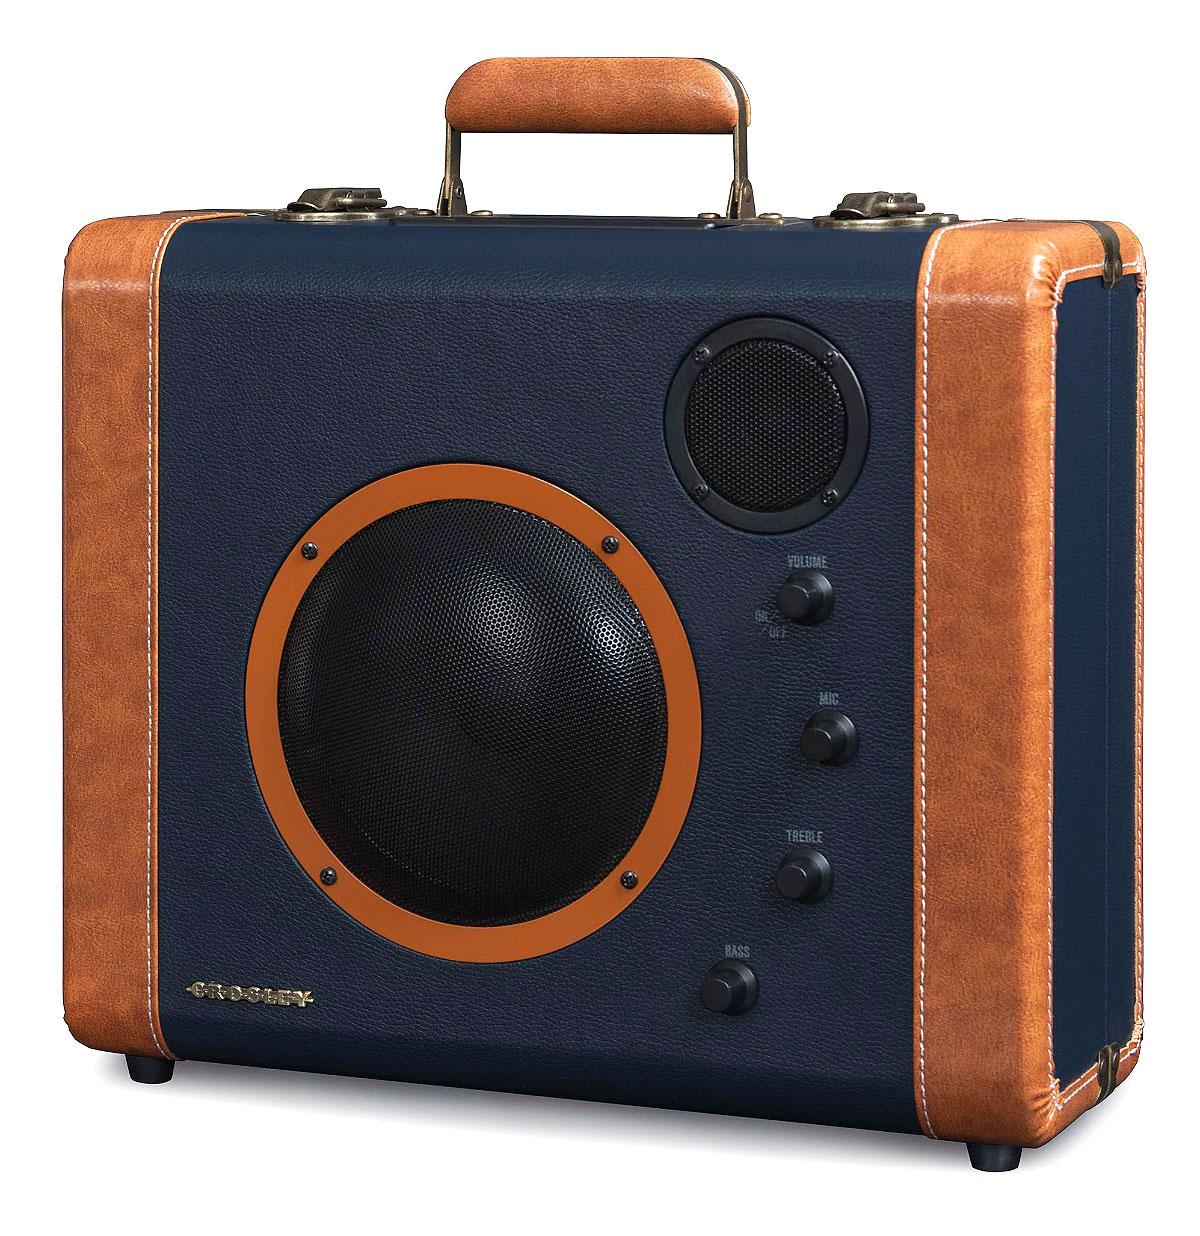 Crosley Soundbomb Portable Speaker System Blauw - Vintage Suitcase